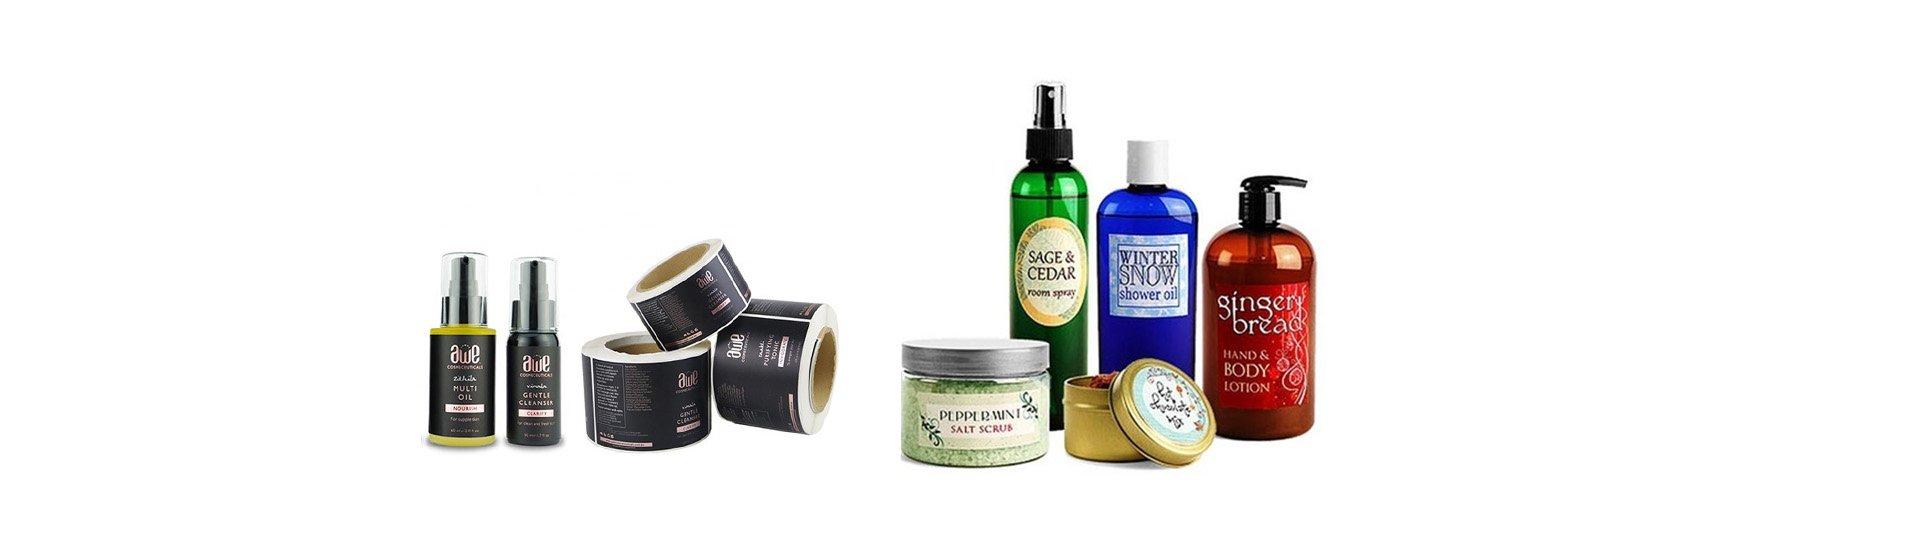 beauty labels supplier